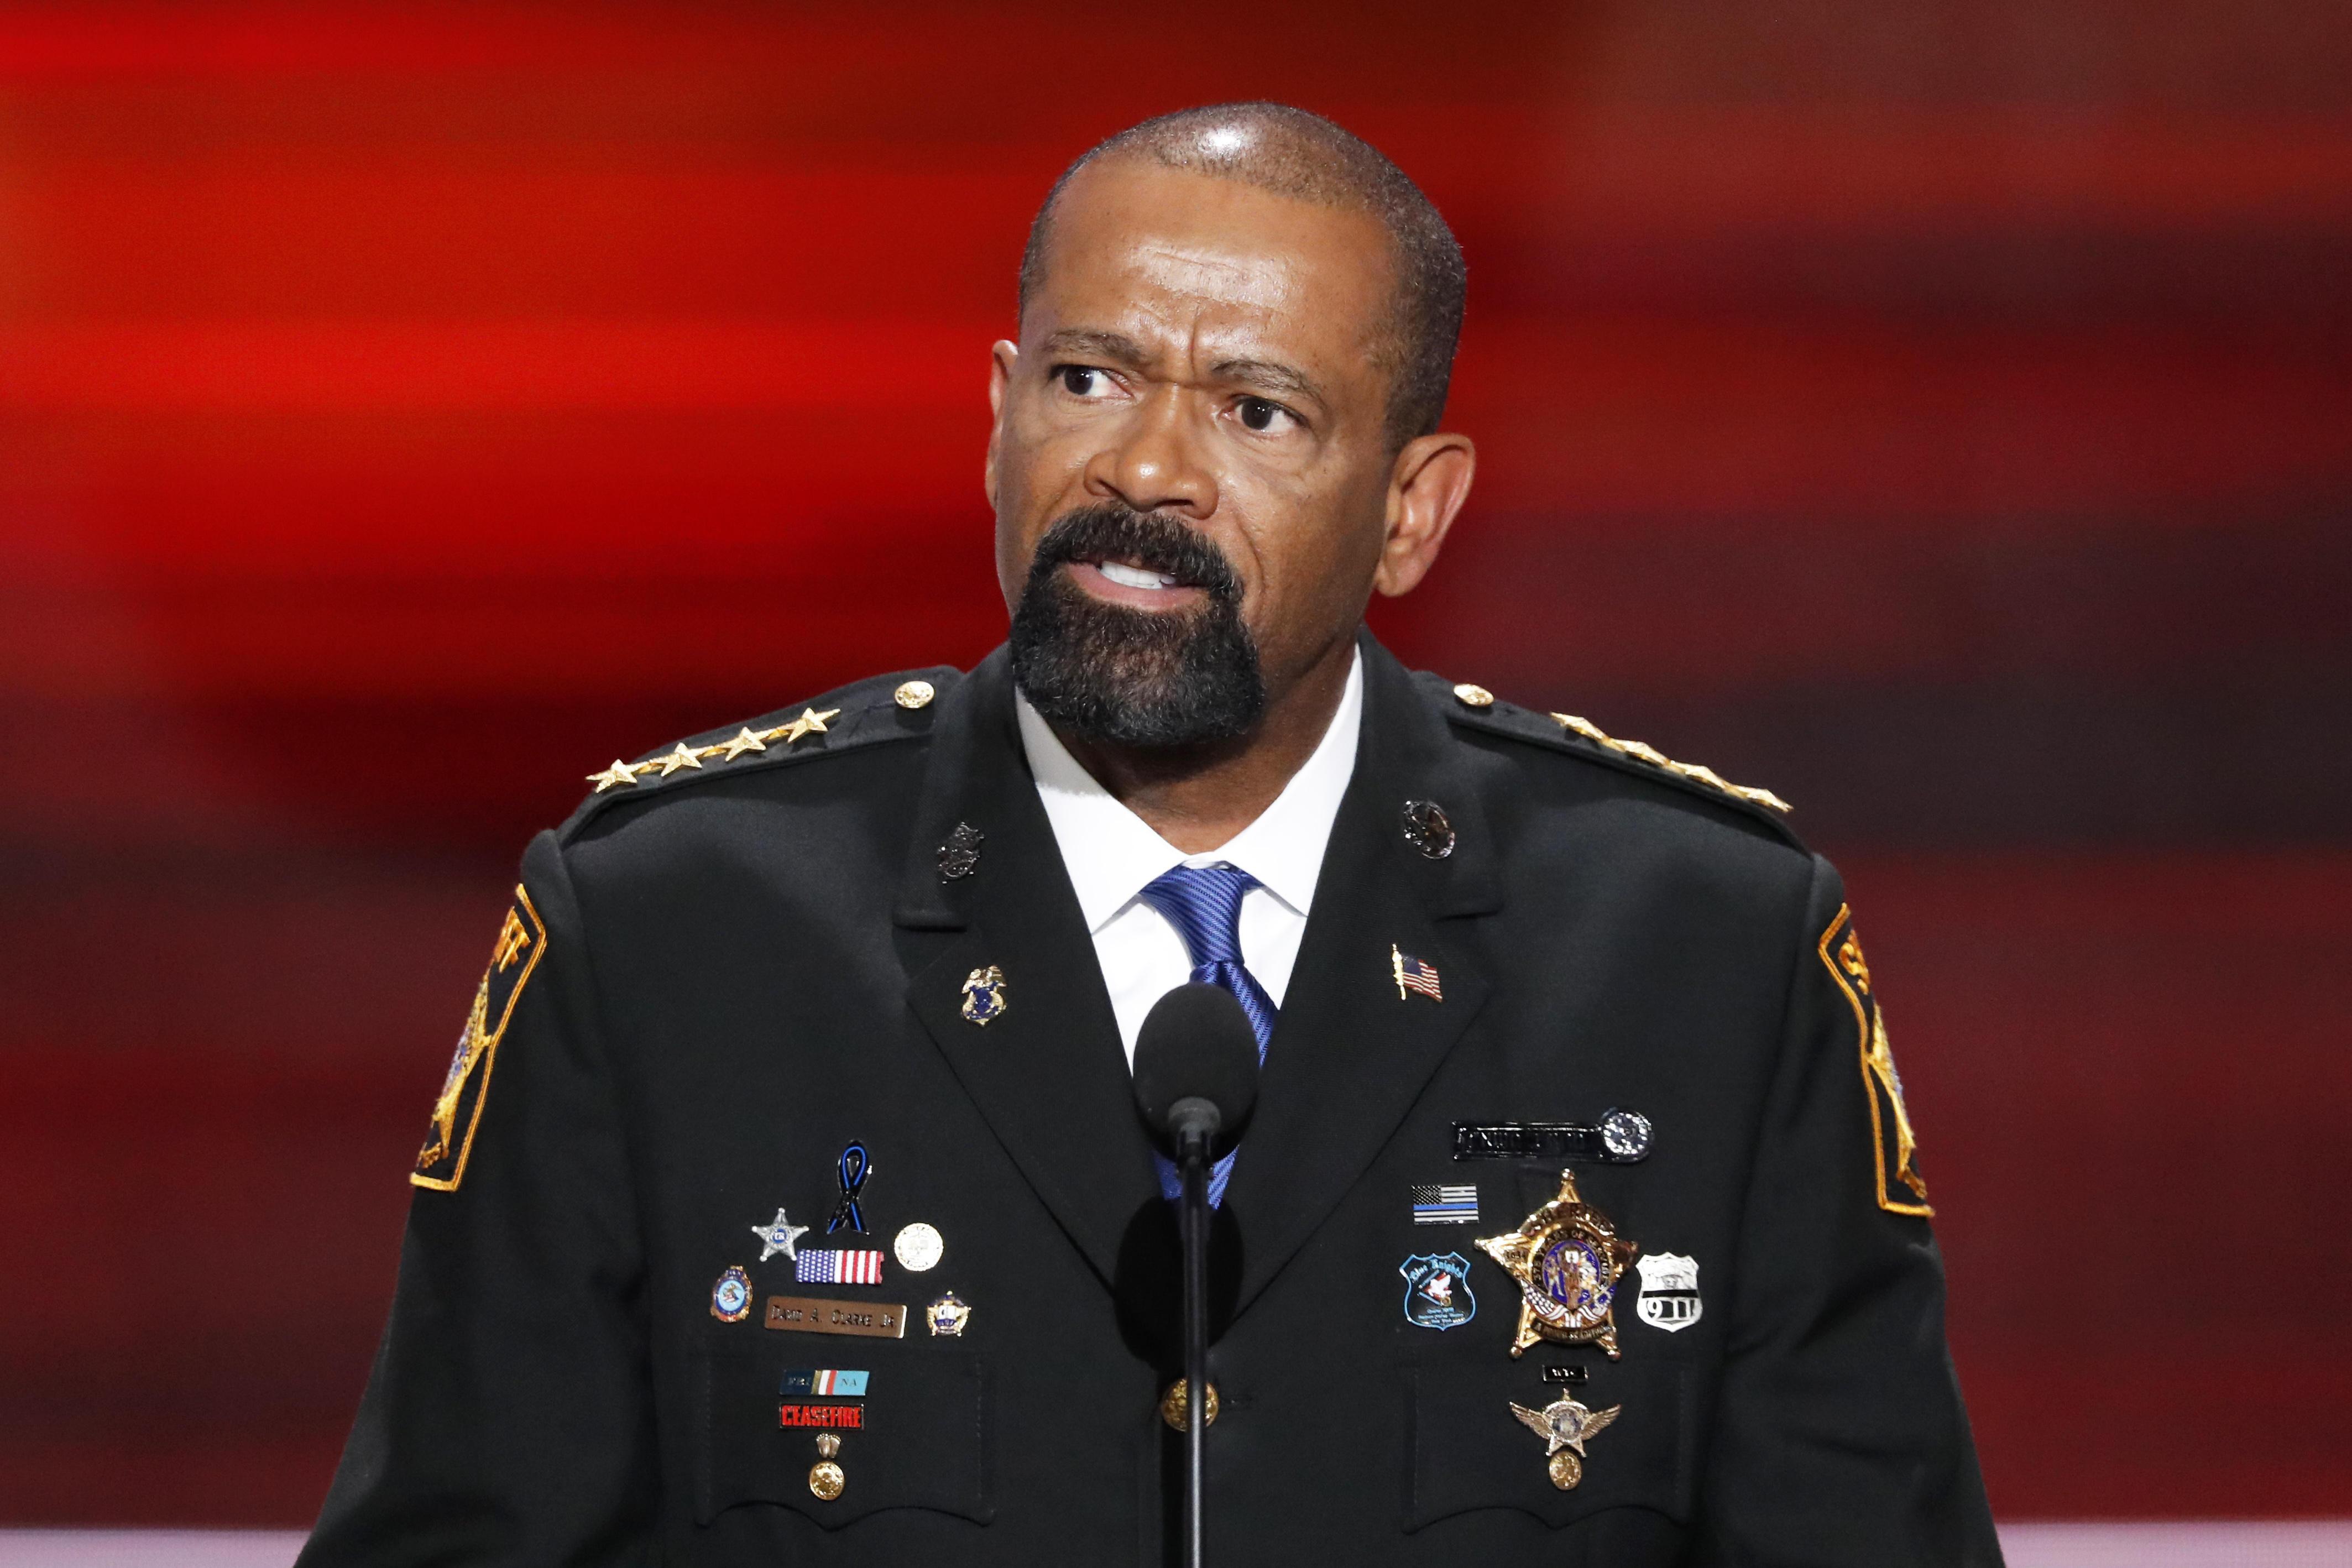 8008927c431 Controversial Milwaukee Sheriff David Clarke takes job with Homeland  Security